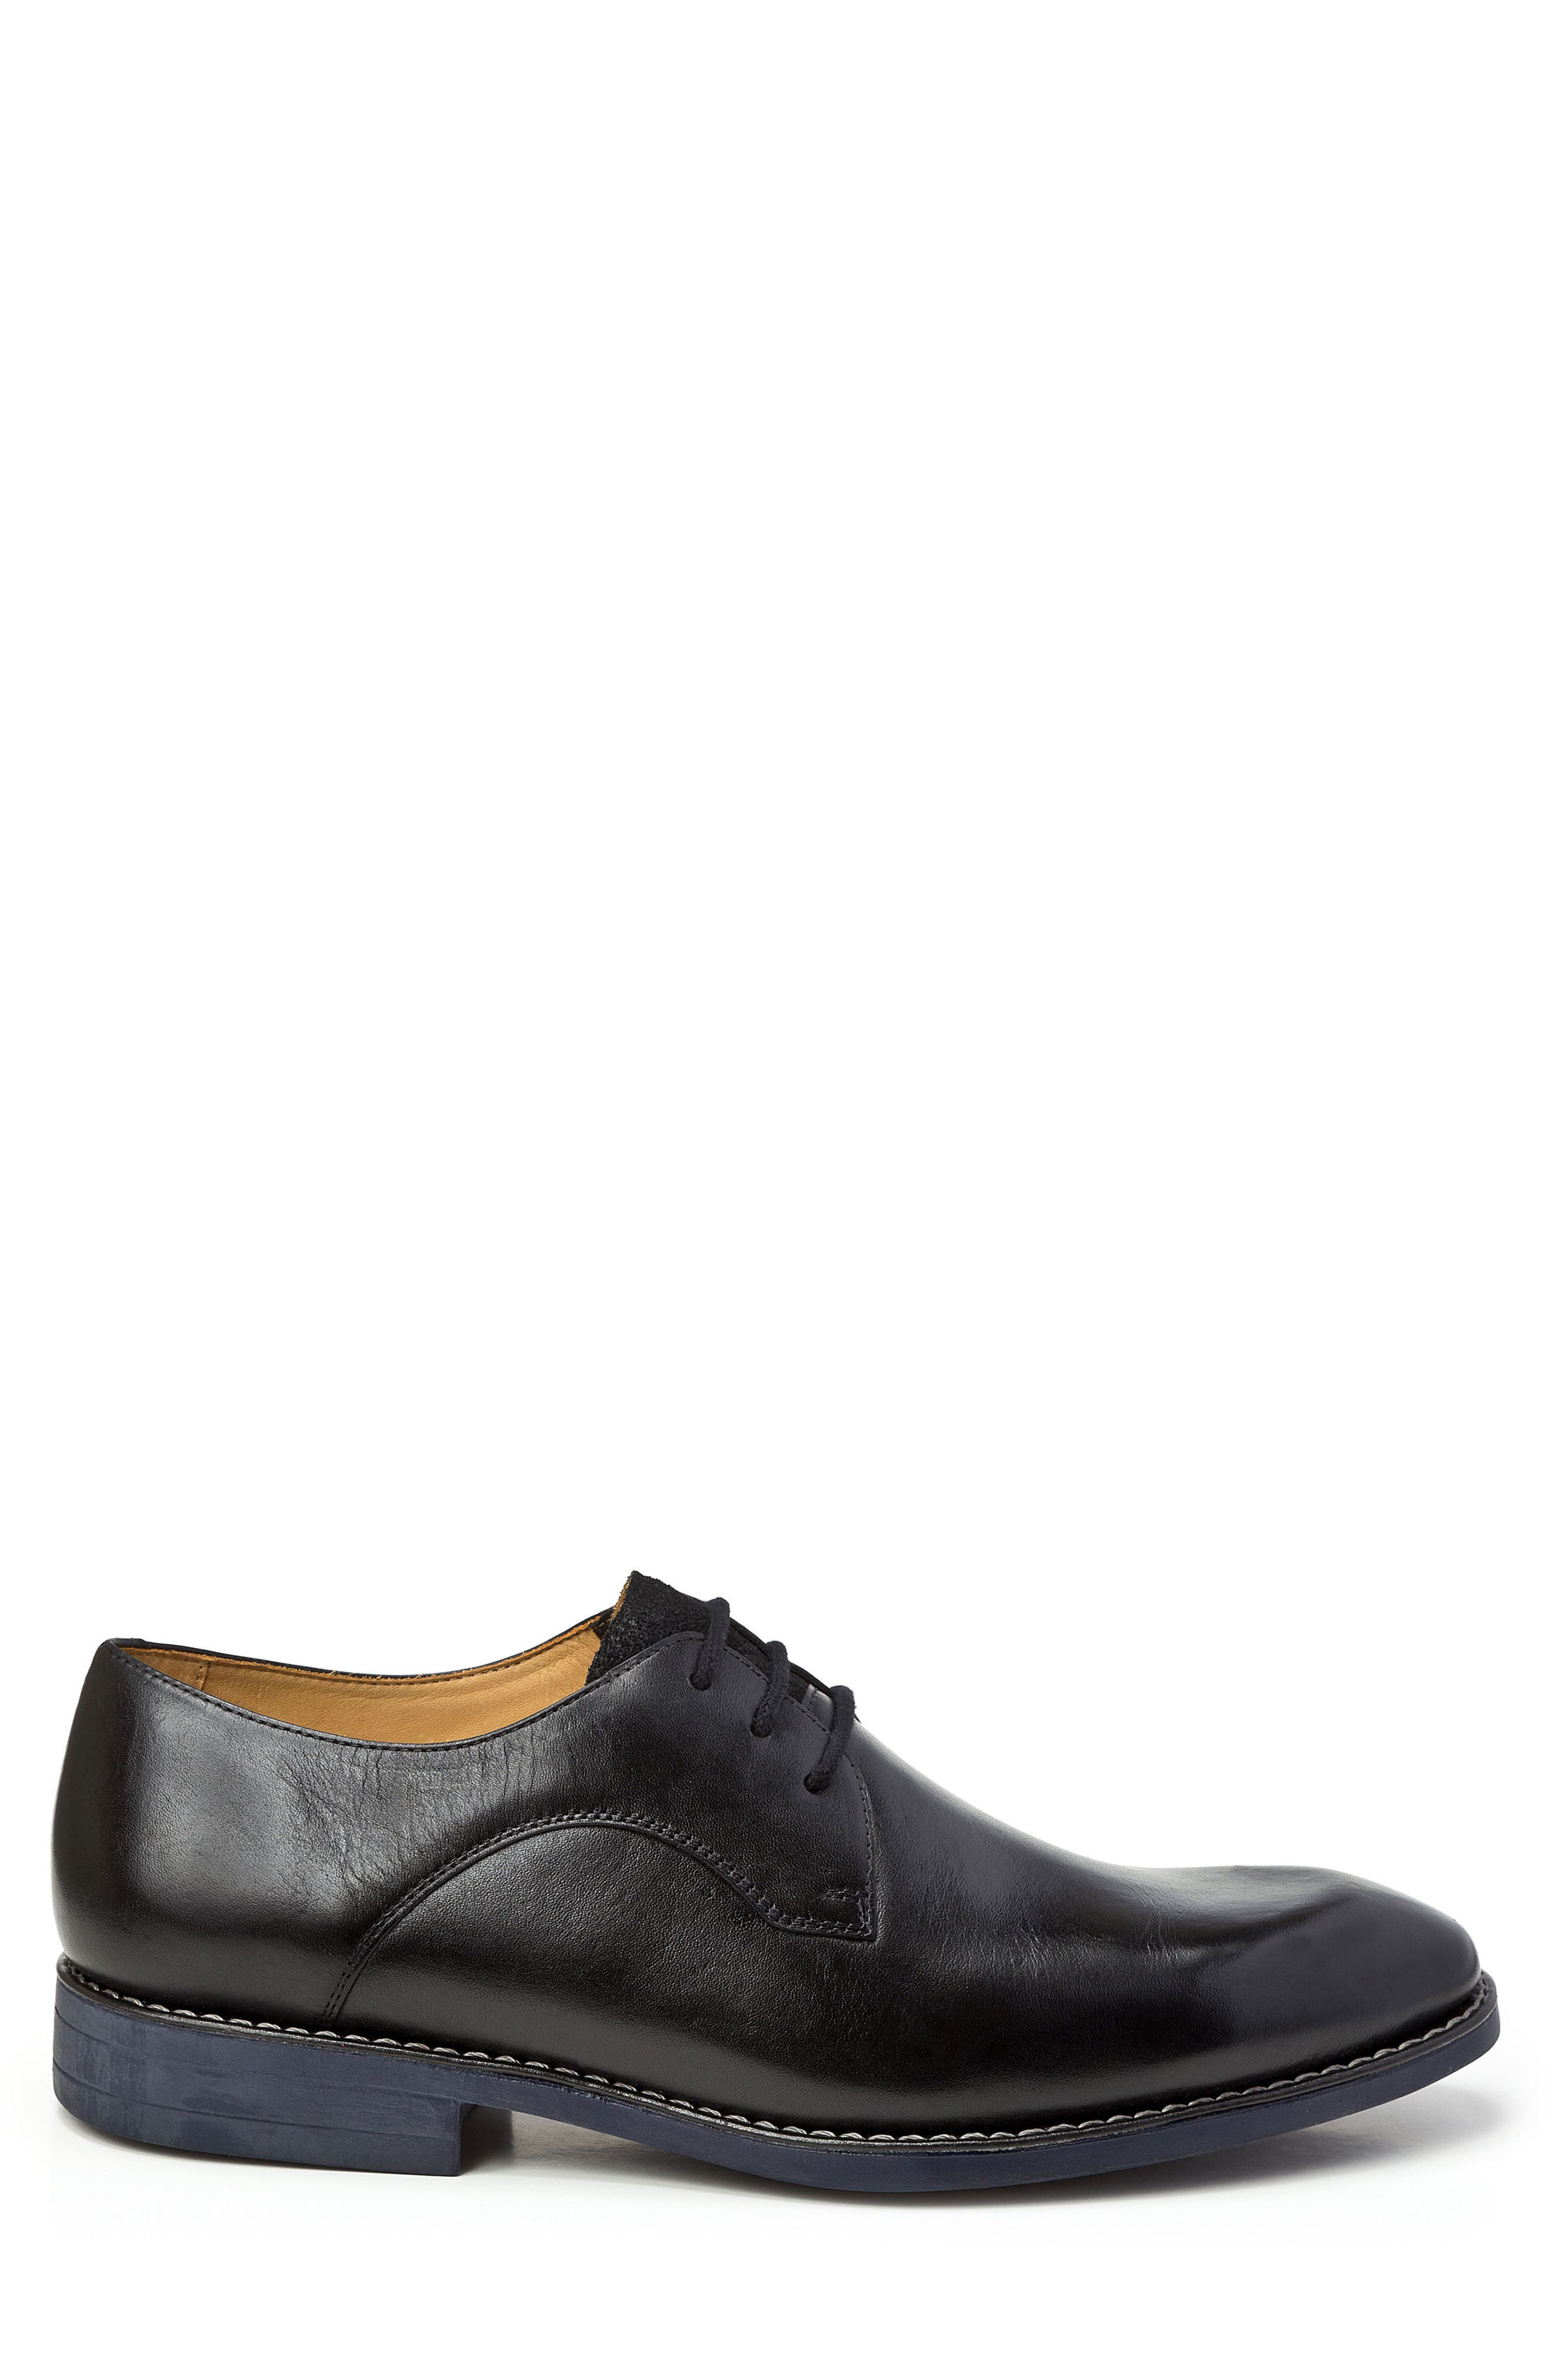 Garret Plain Toe Derby,                             Alternate thumbnail 3, color,                             BLACK LEATHER